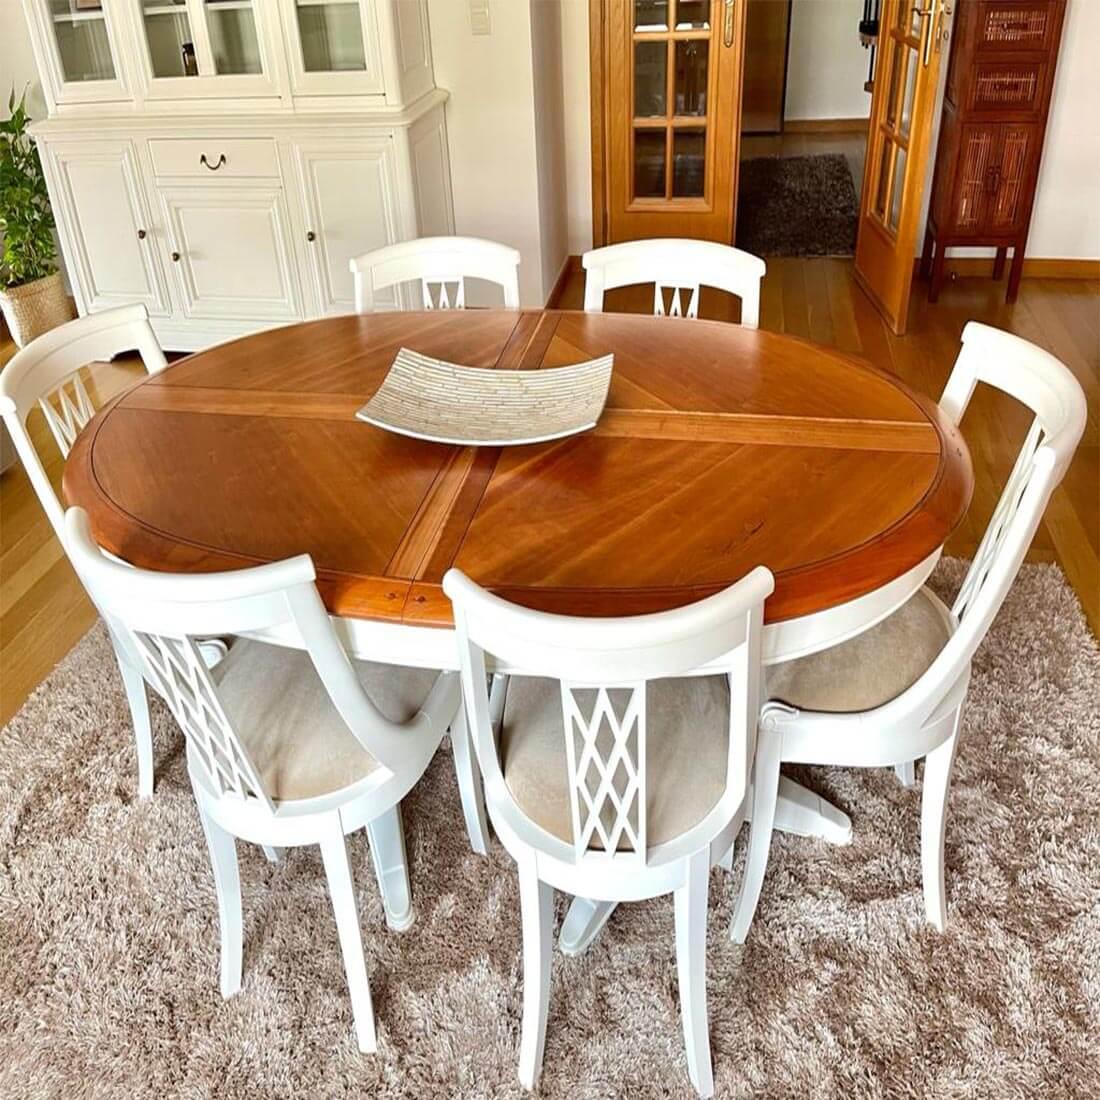 mesa de jantar depois